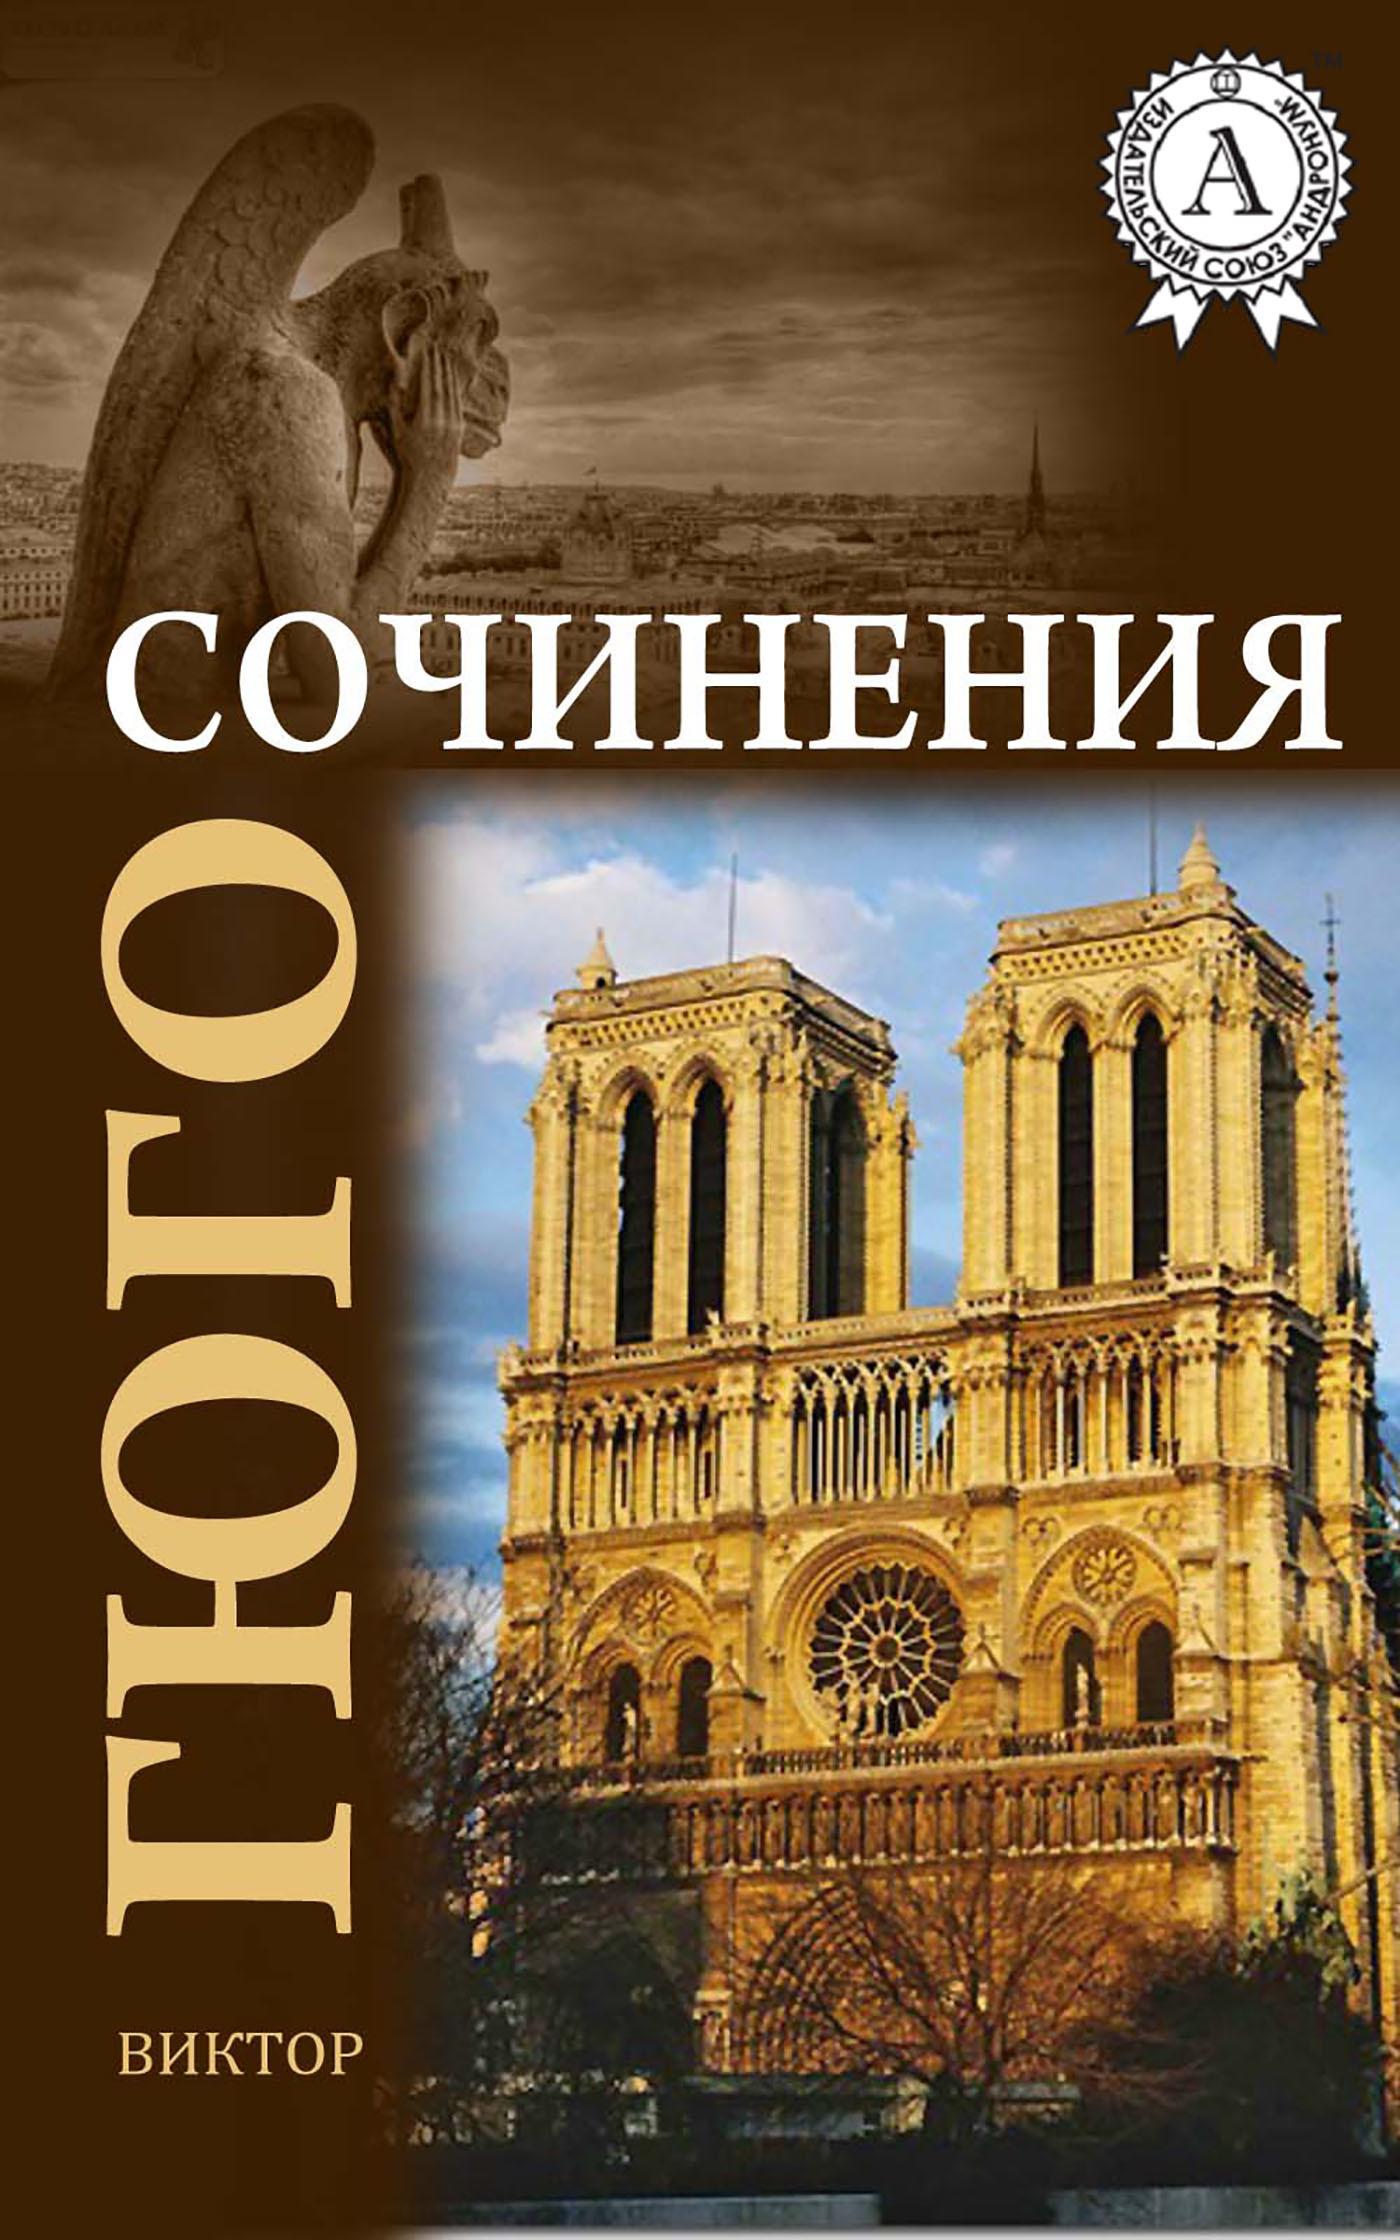 цена на Виктор Мари Гюго Сочинения